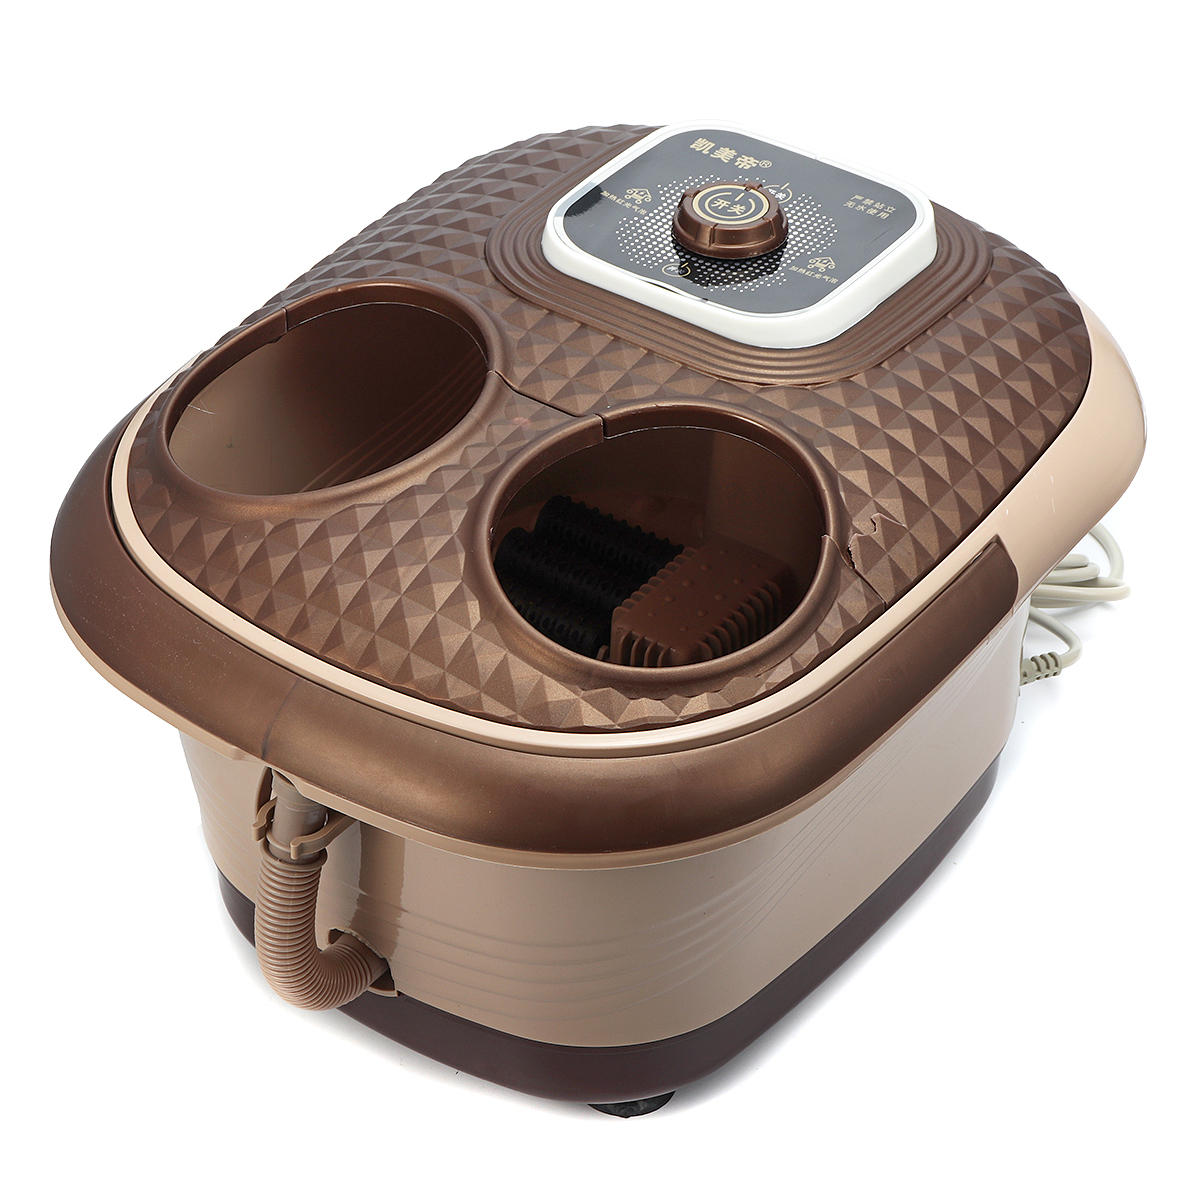 220V 500W Foot Spa Bath Electric Massager